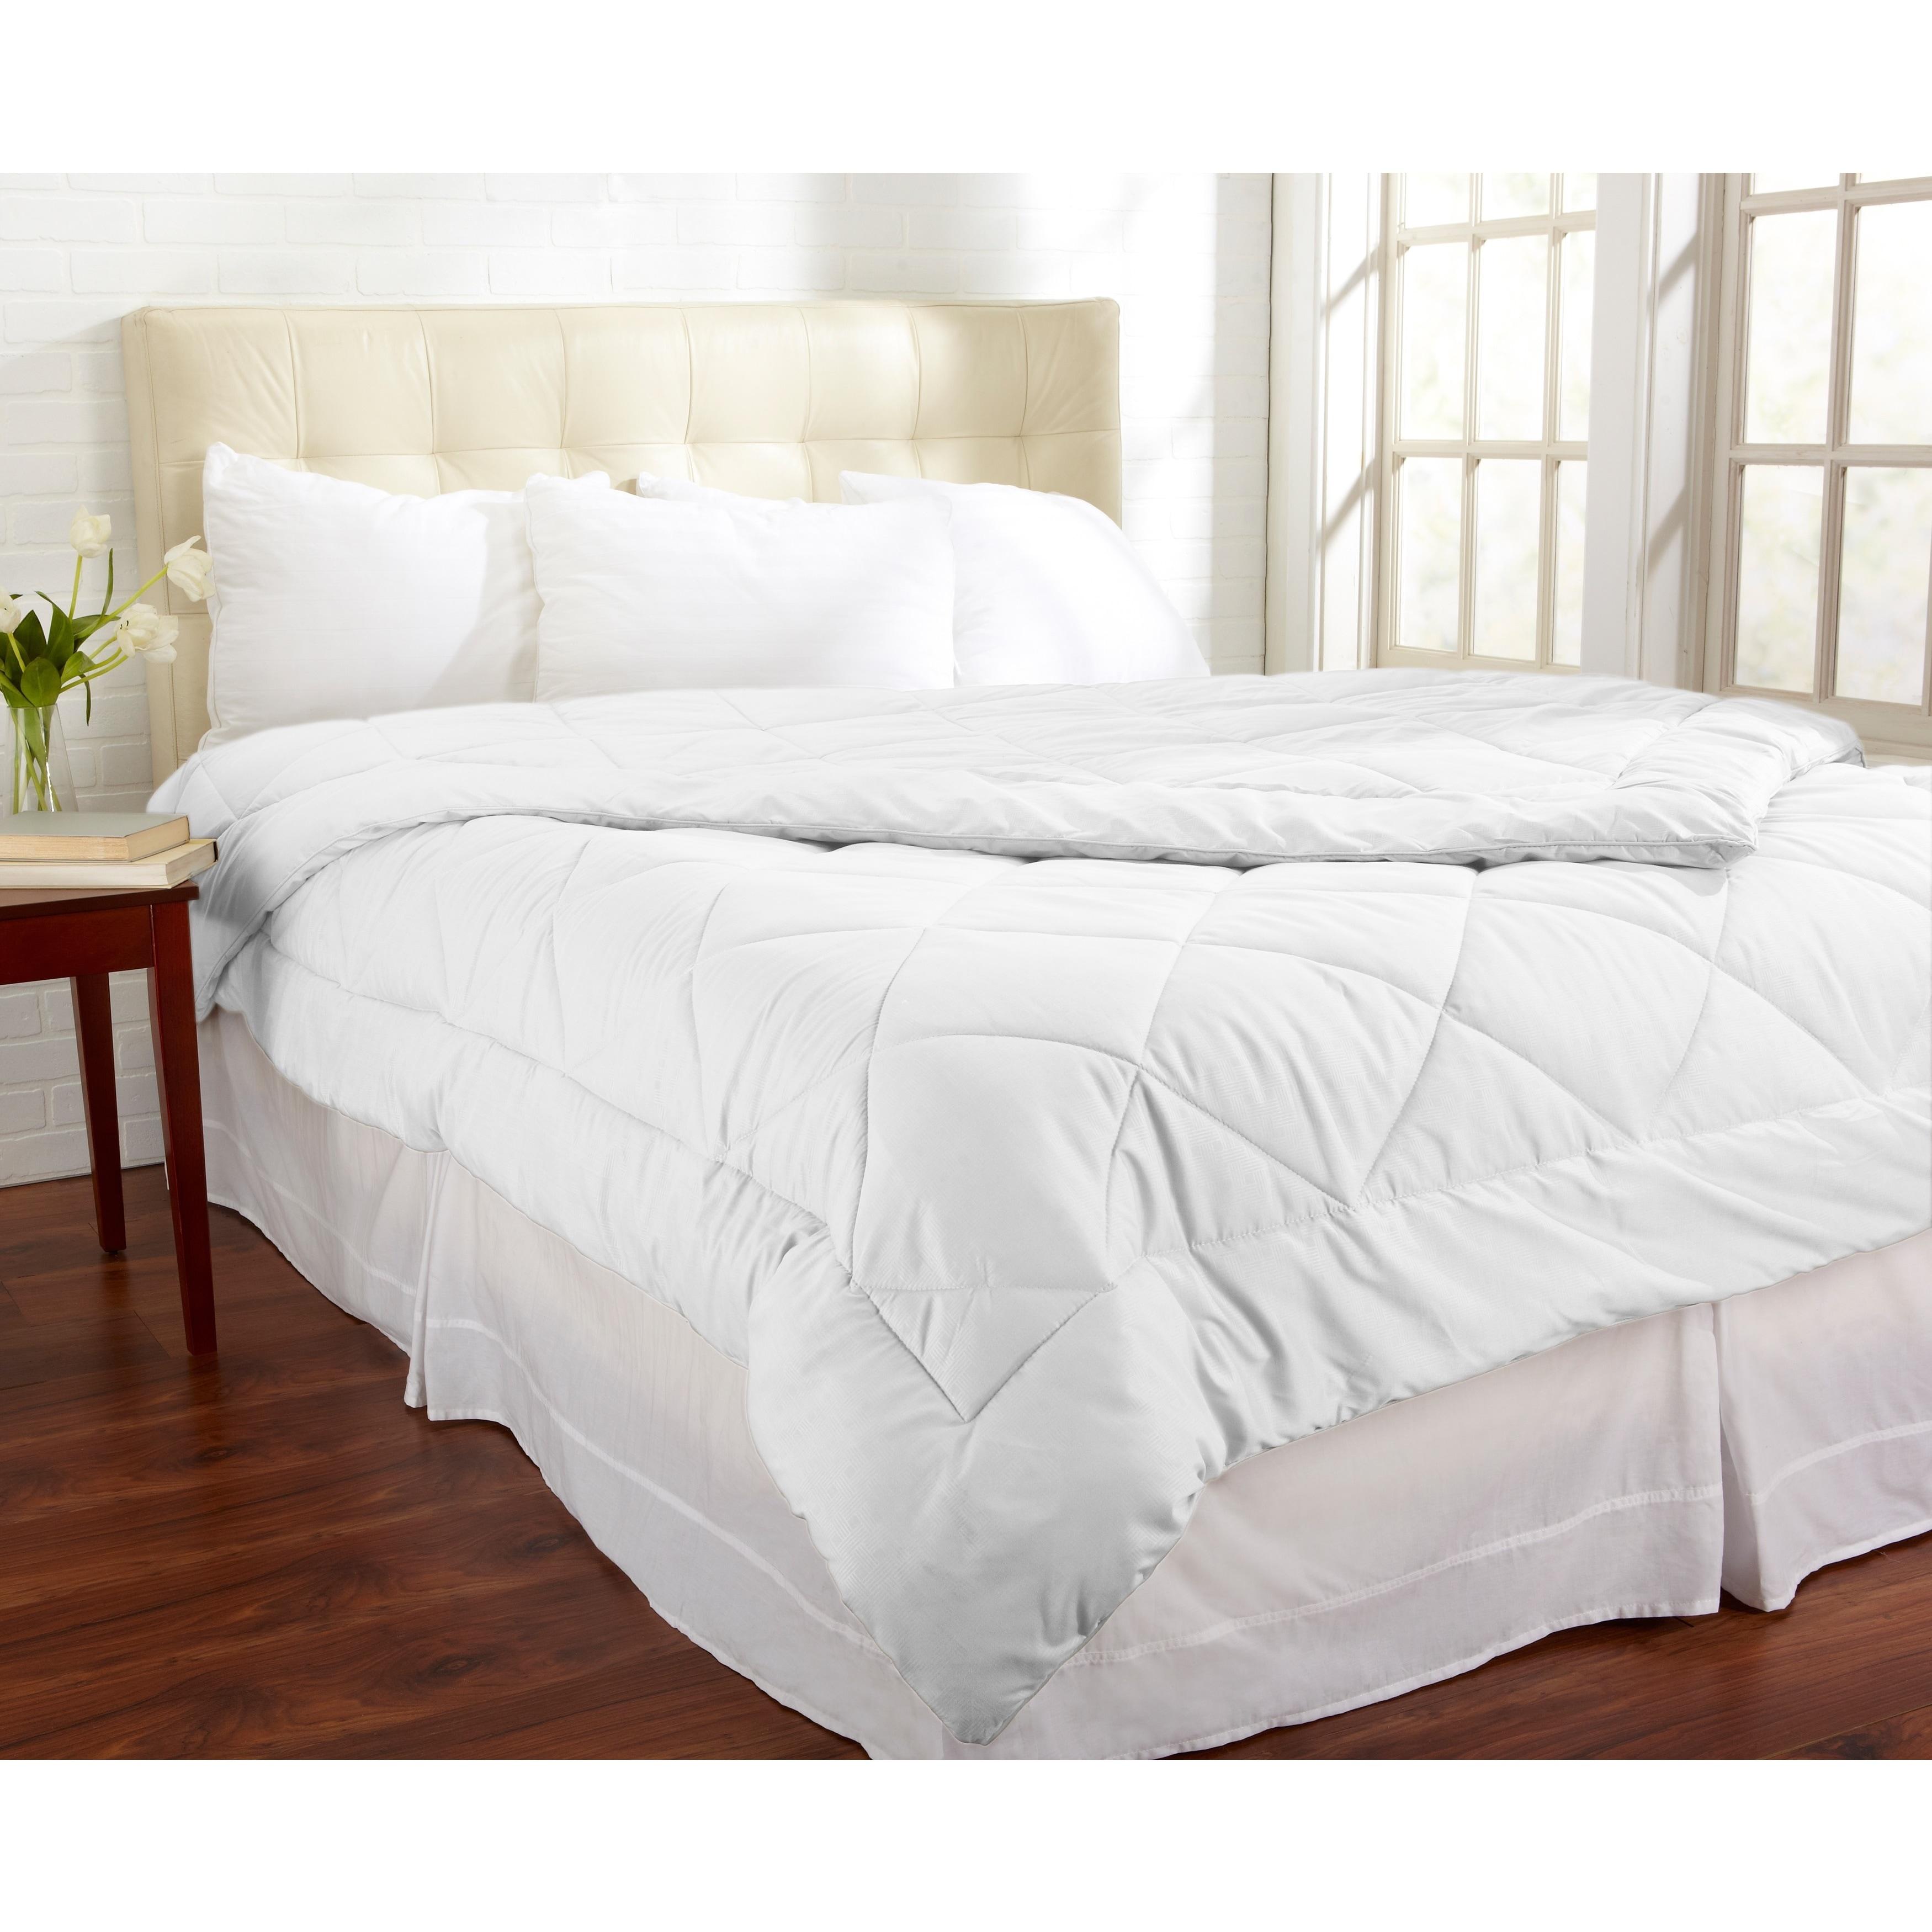 Home Design Down Alternative Color Full Queen Comforter - Night Sky ...